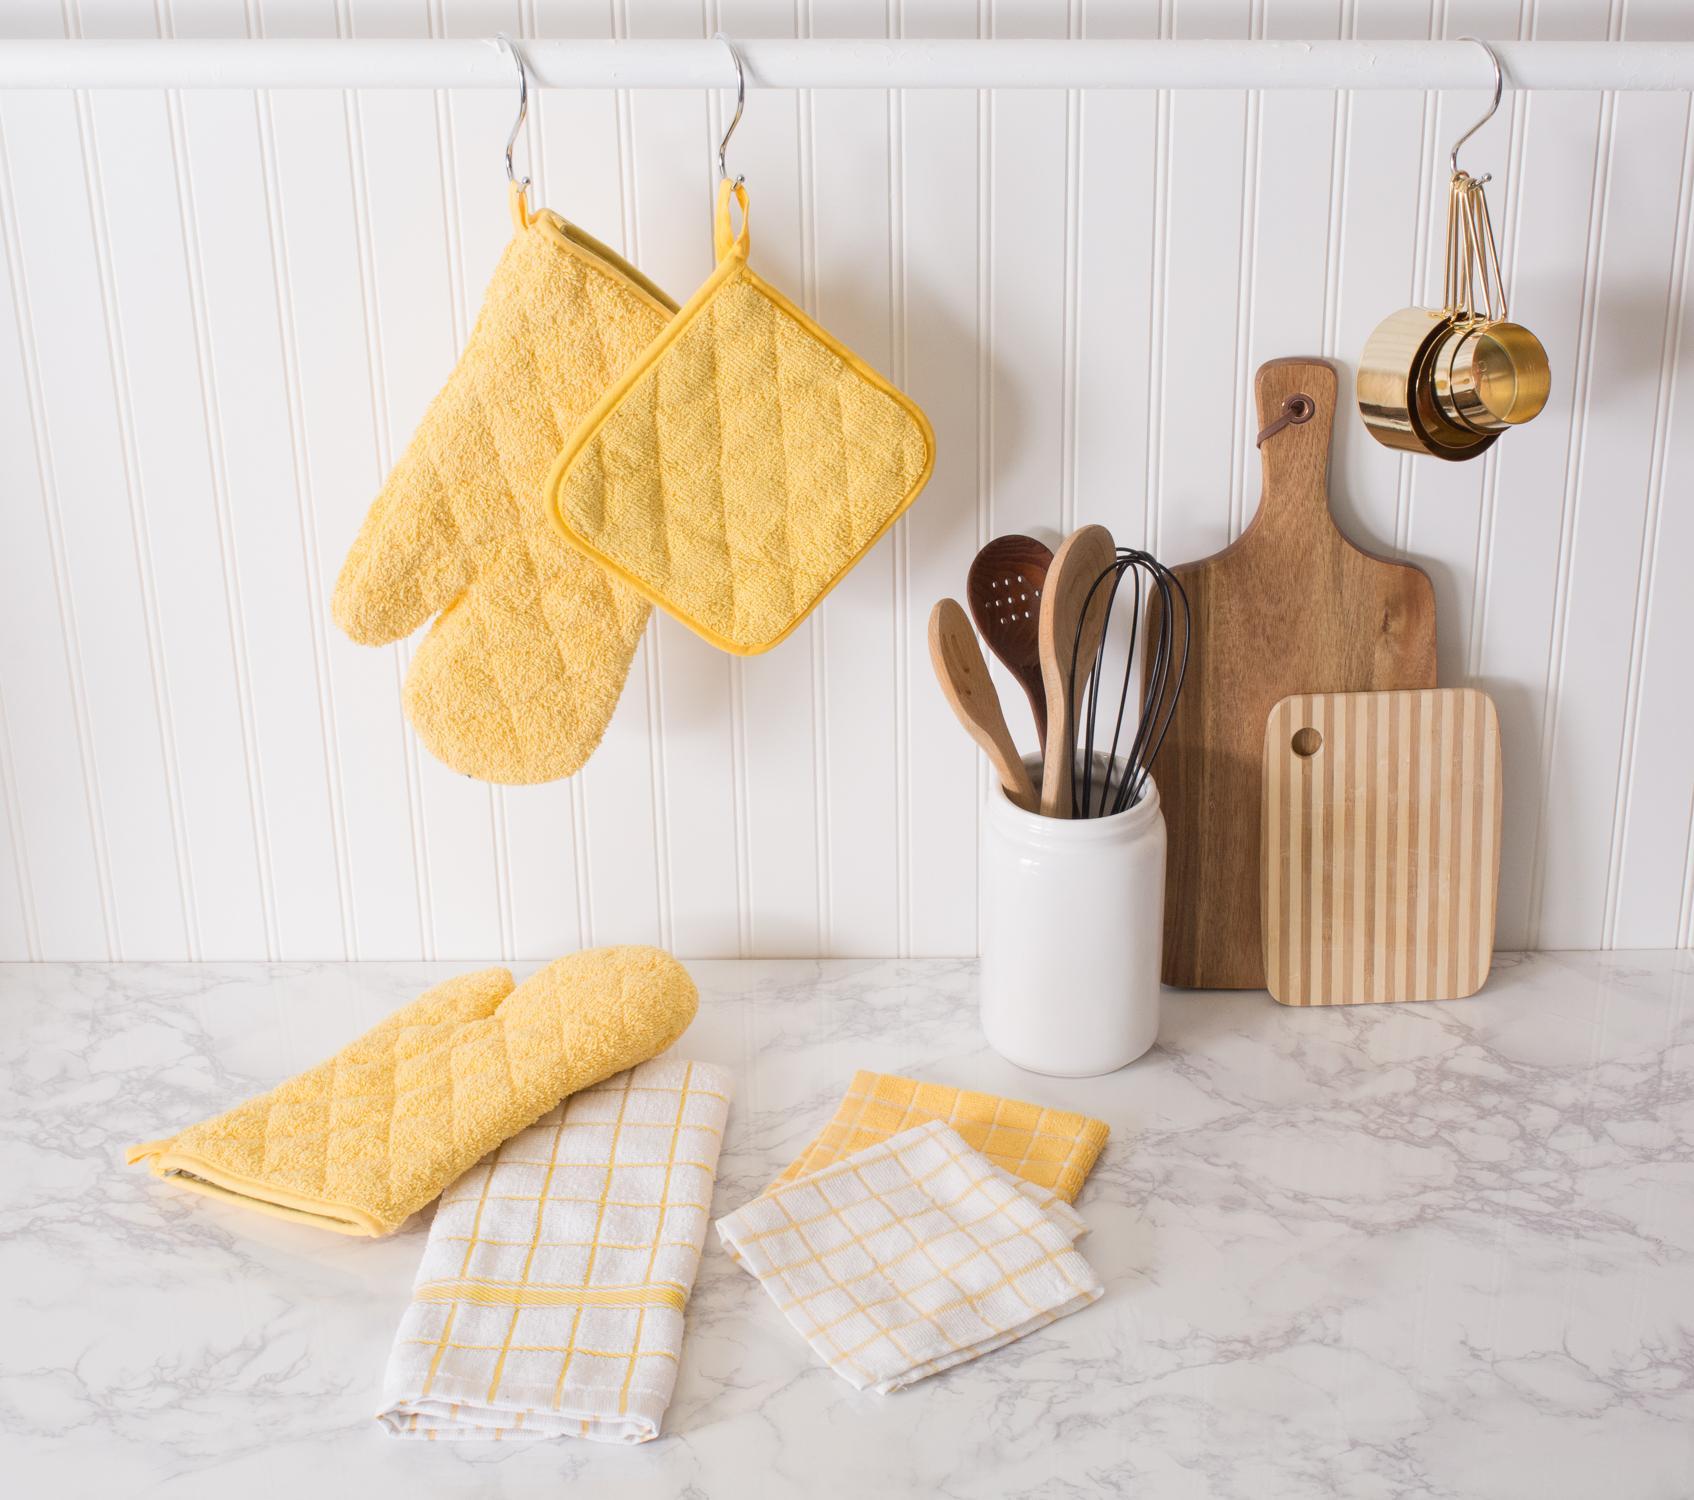 Dish Towel Stuck In Garbage Disposal: DII Cotton Terry Windowpane Dish Cloths, 12 X 12 Set Of 6